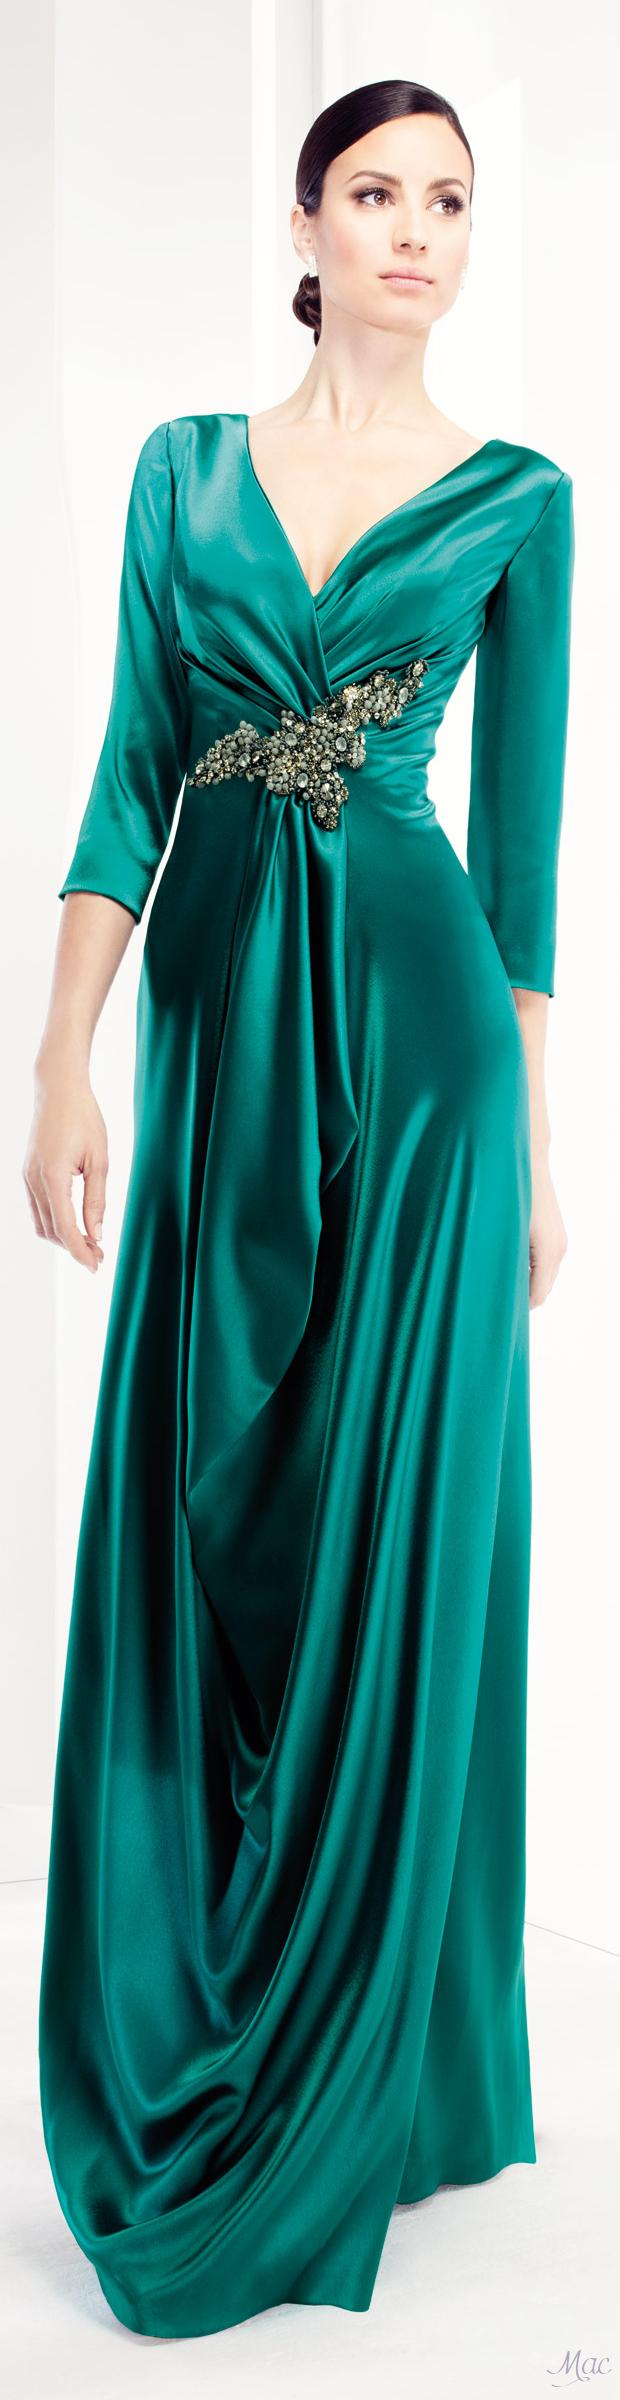 Patricia Avendaño Platinum Collection   Vestido madrina   Pinterest ...